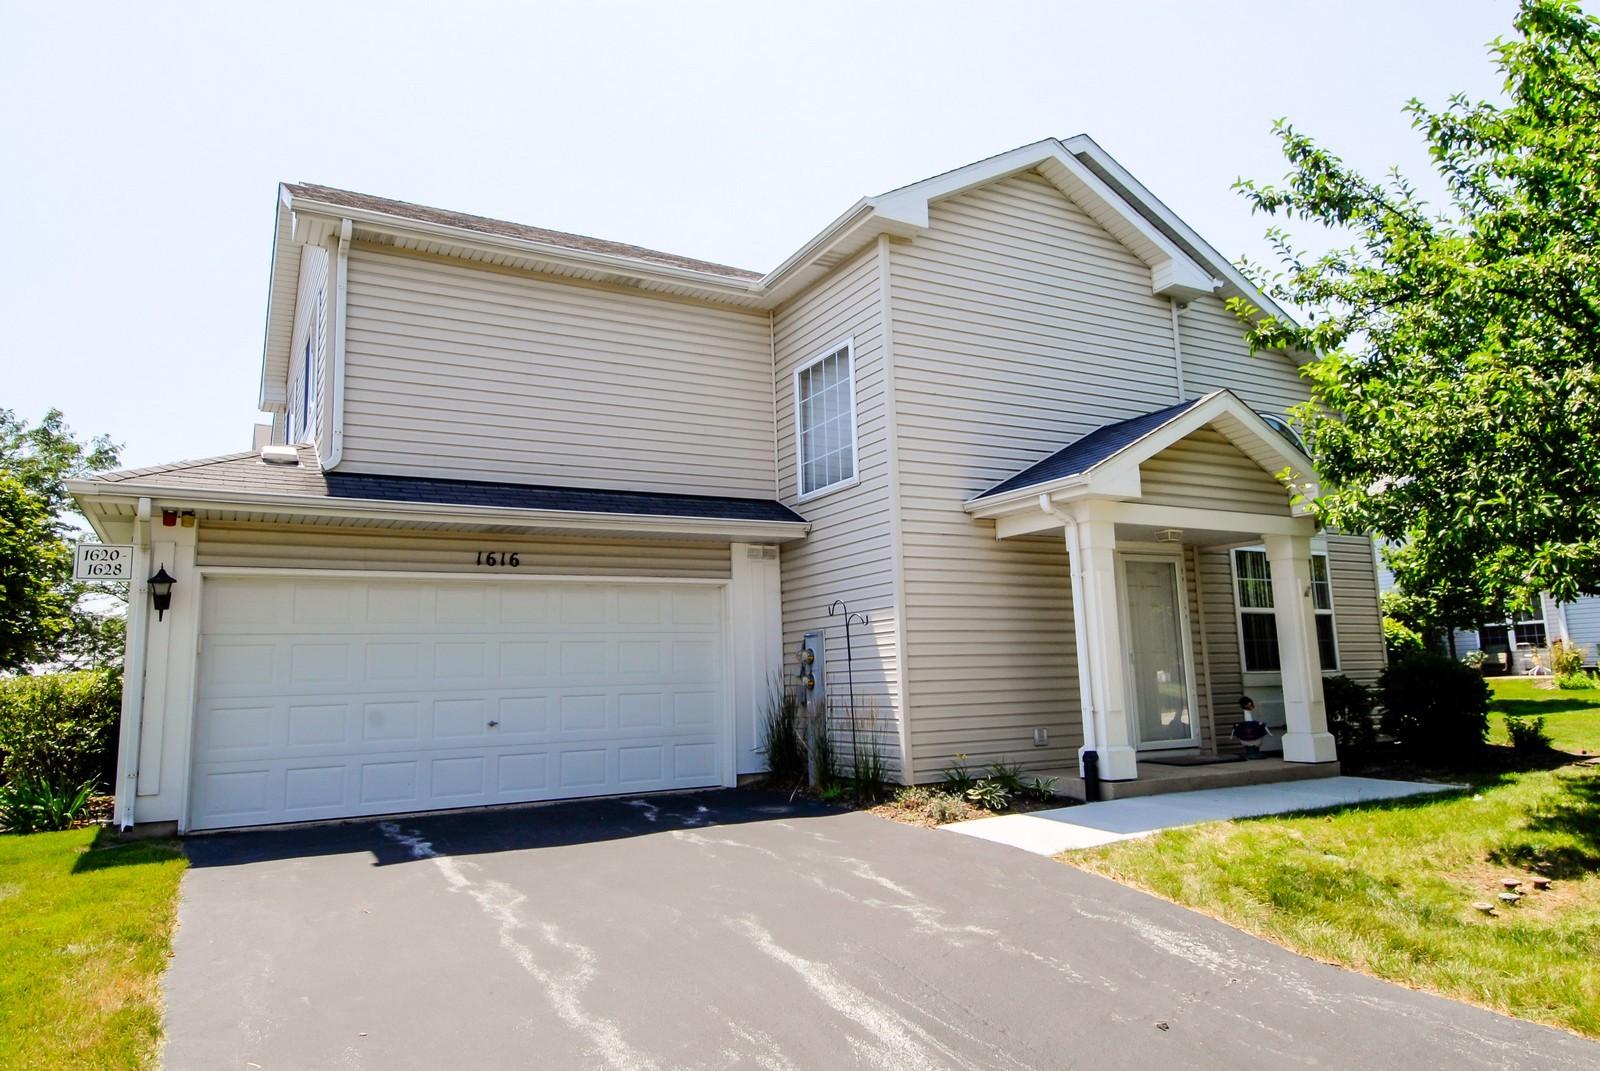 Real Estate Photography - 1616 Abington Ln, North Aurora, IL, 60542 - Front View